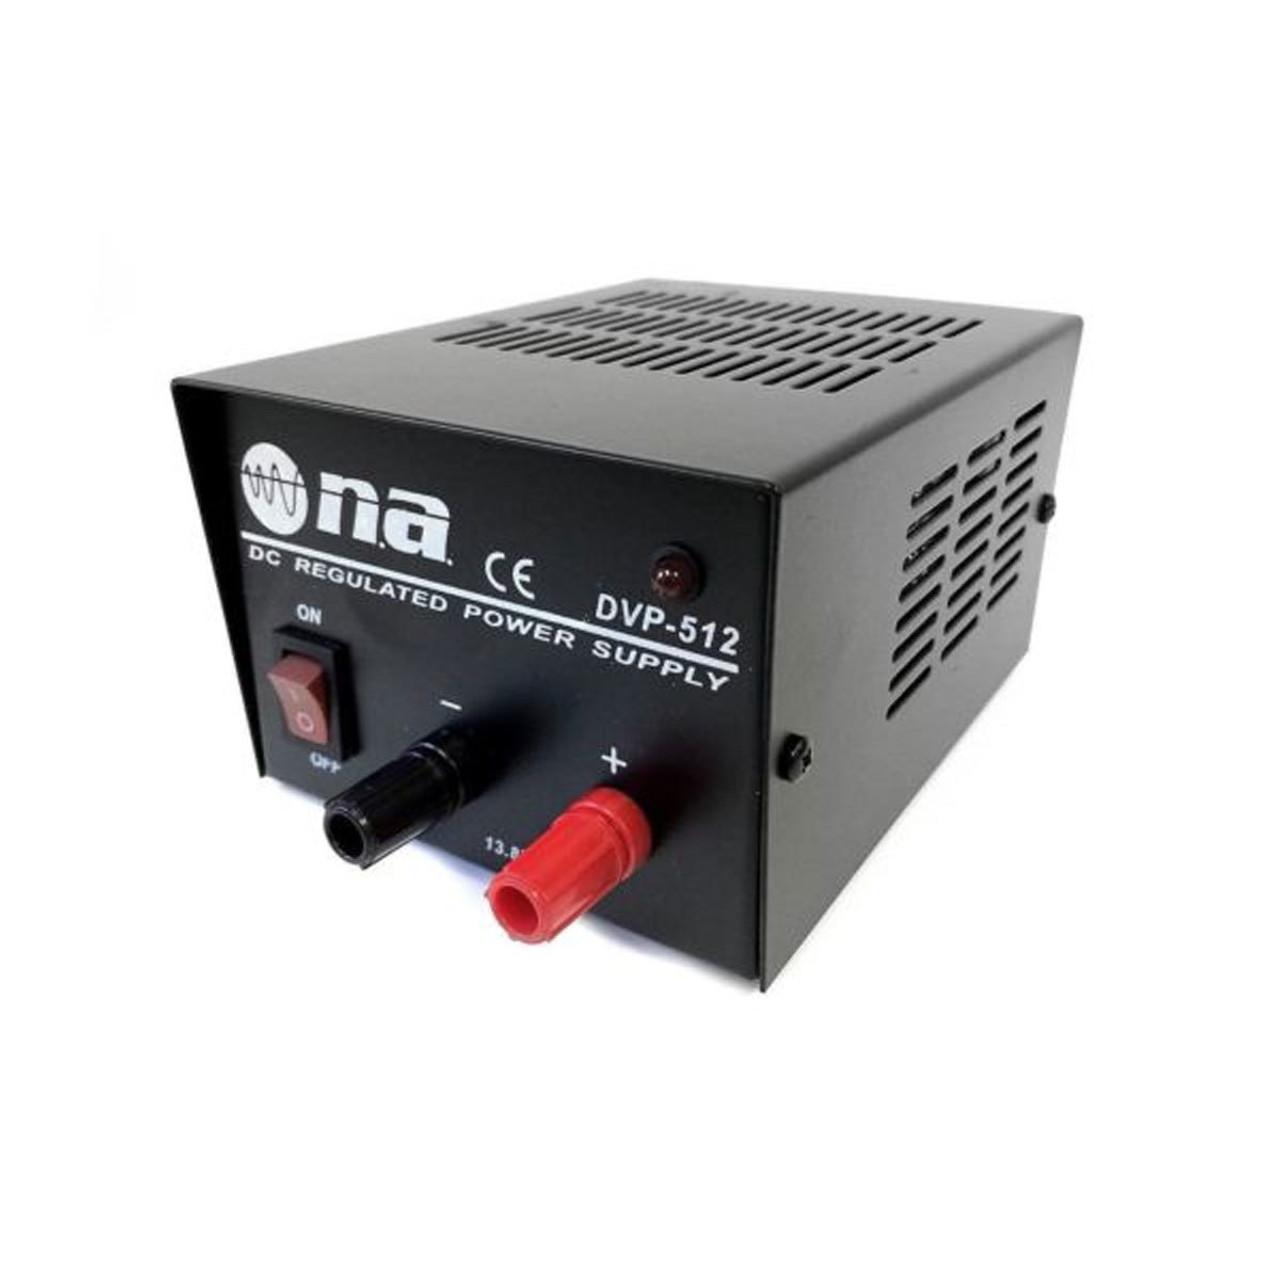 12-Volt DC Regulated Power Supply 3-5 Amp Surge Converter 110 AC to 13 8V